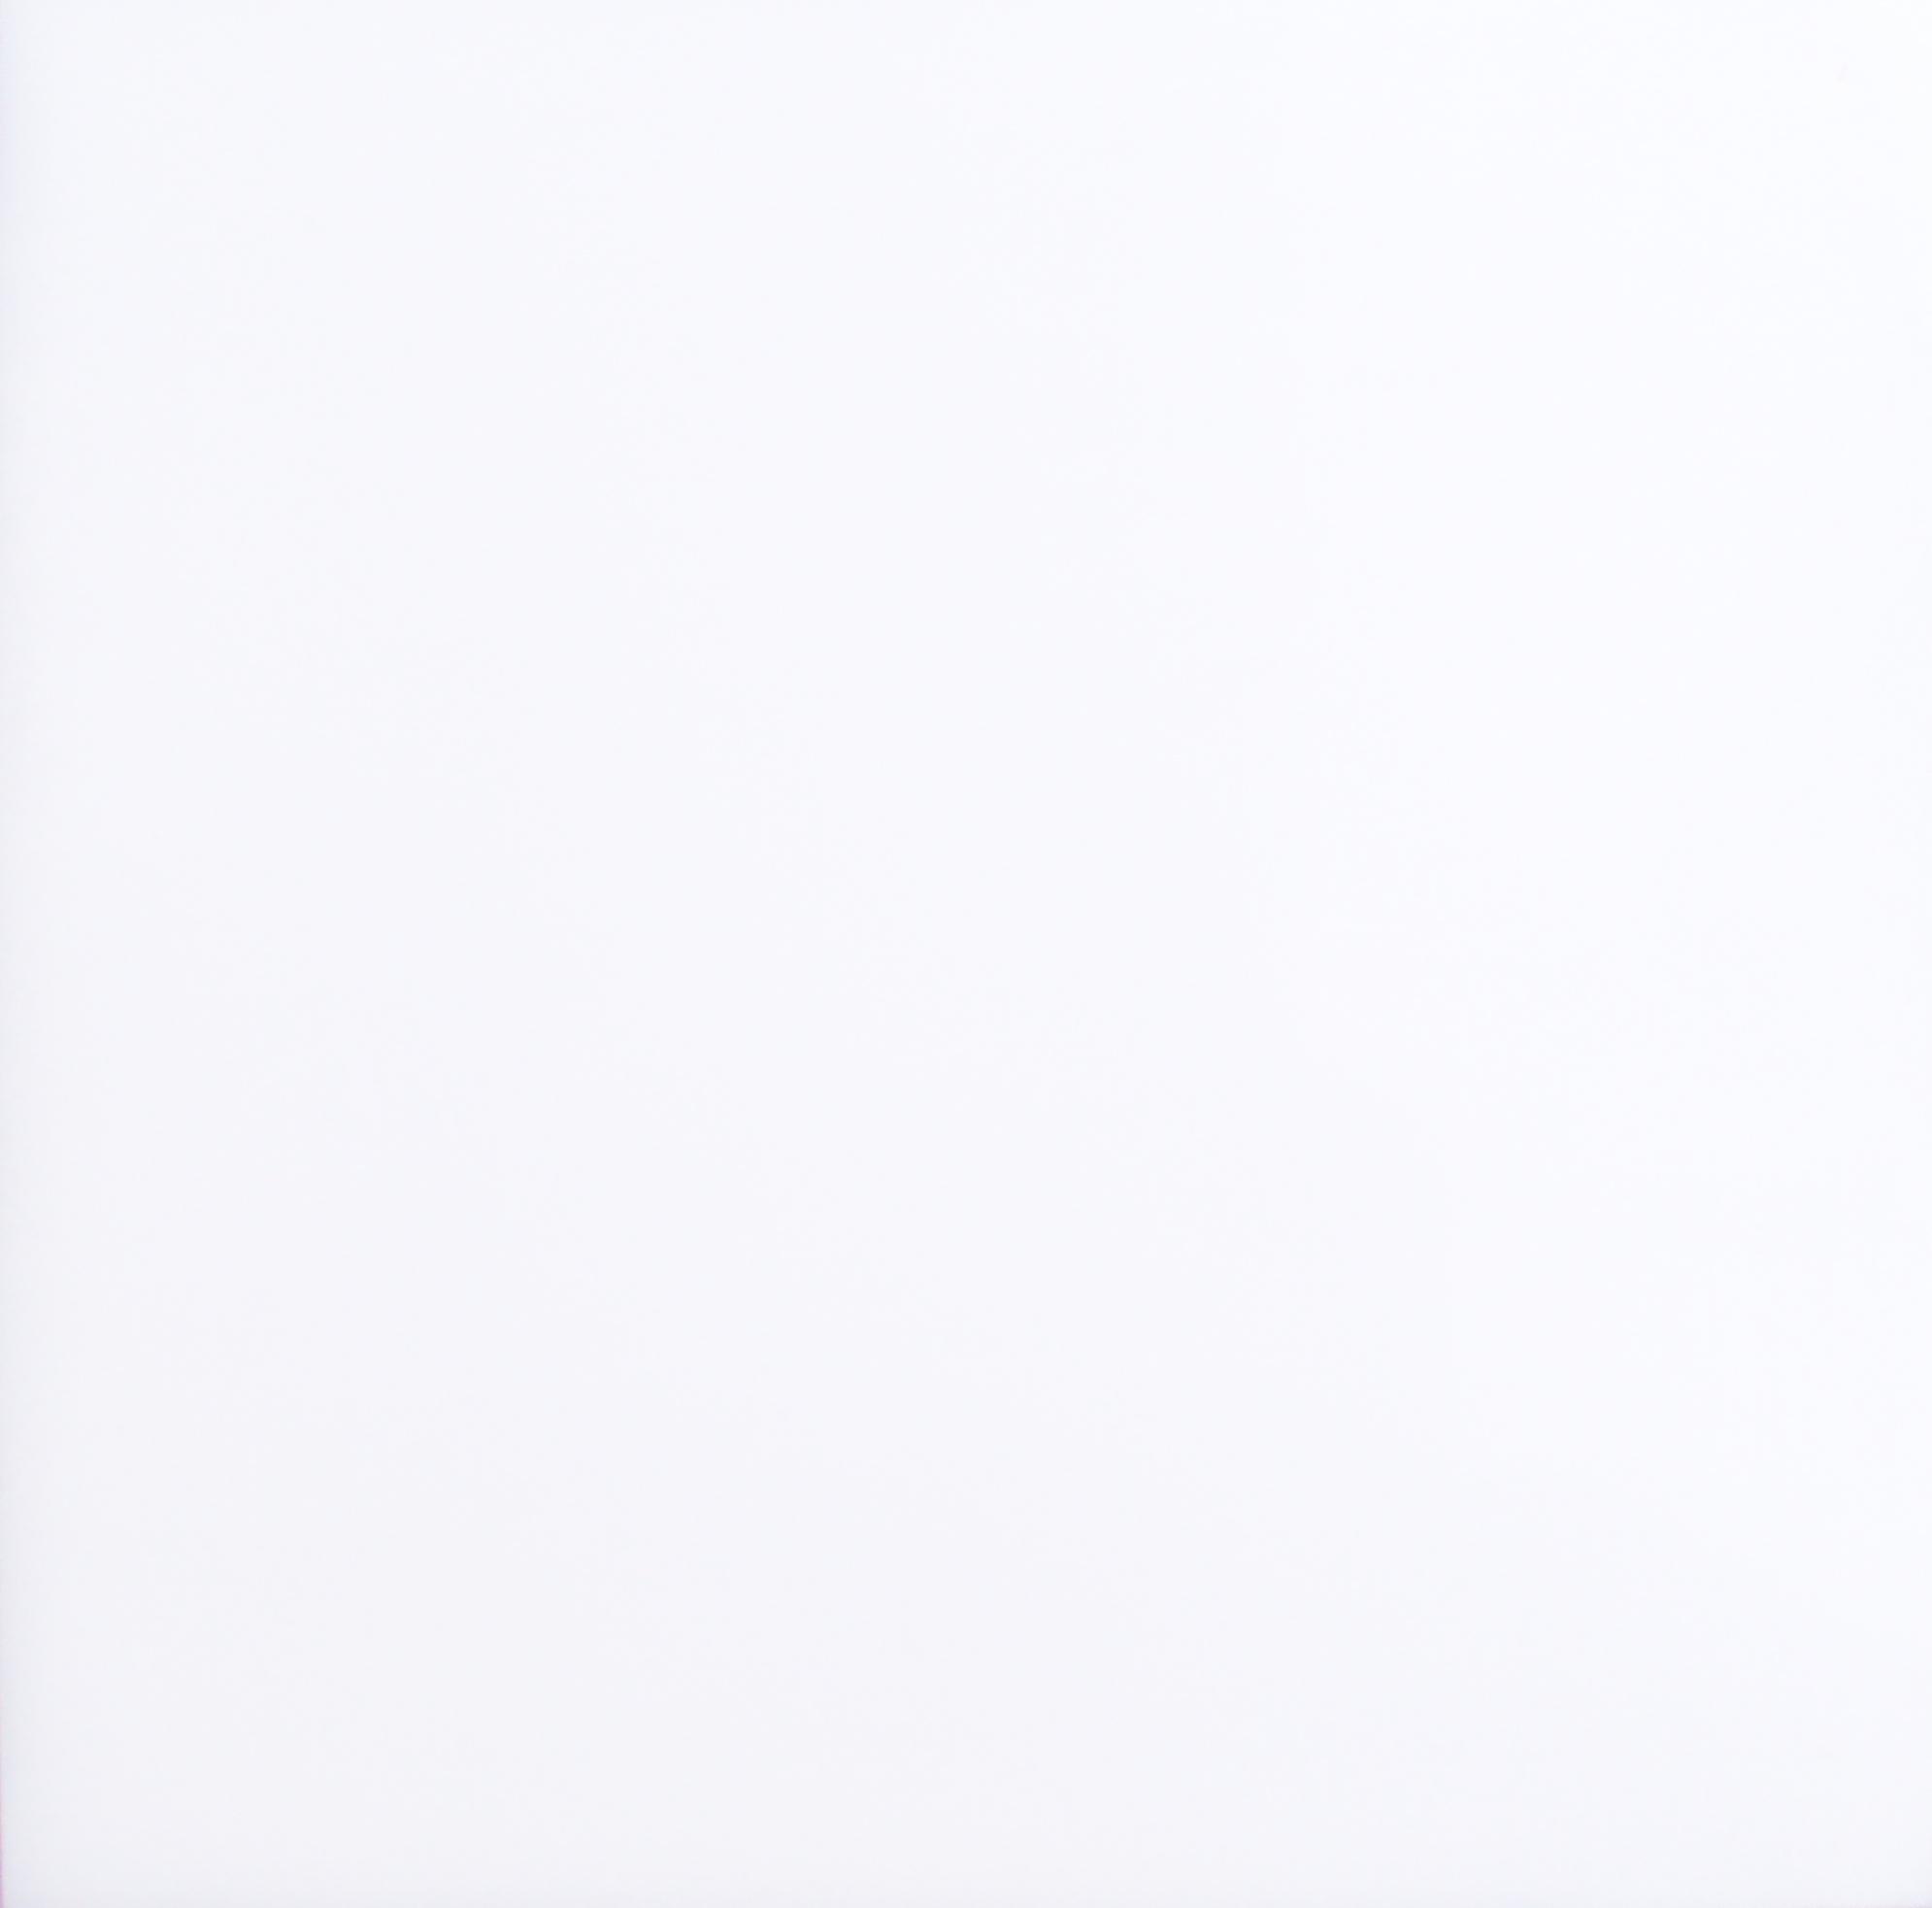 Thassos Marble - Thassos White Marble Selections